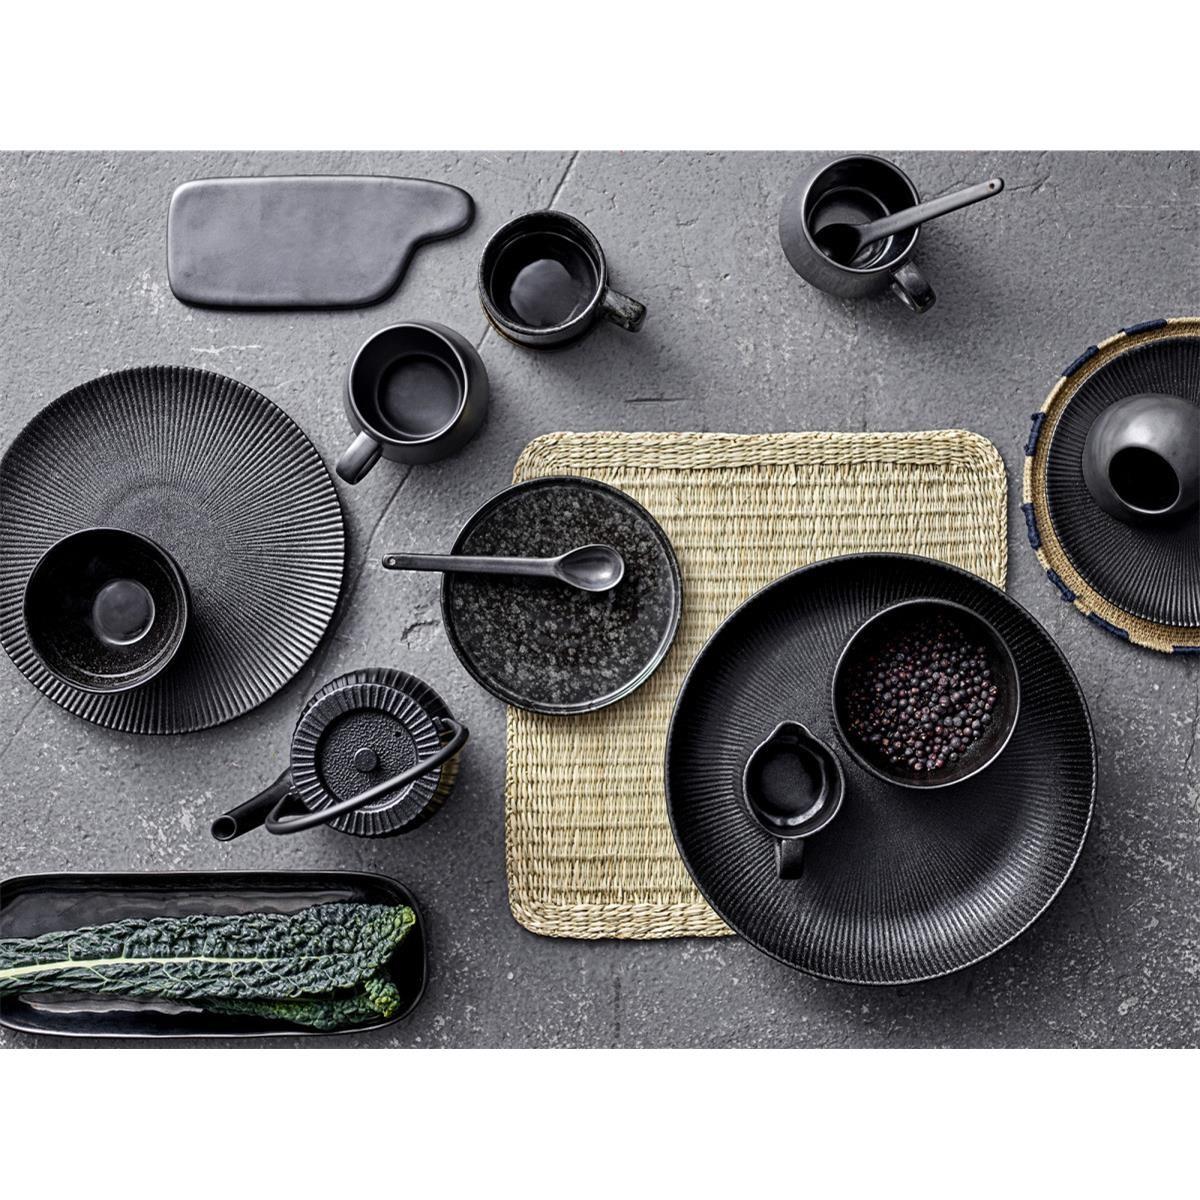 Kameninový talíř Noir 18 cm_1